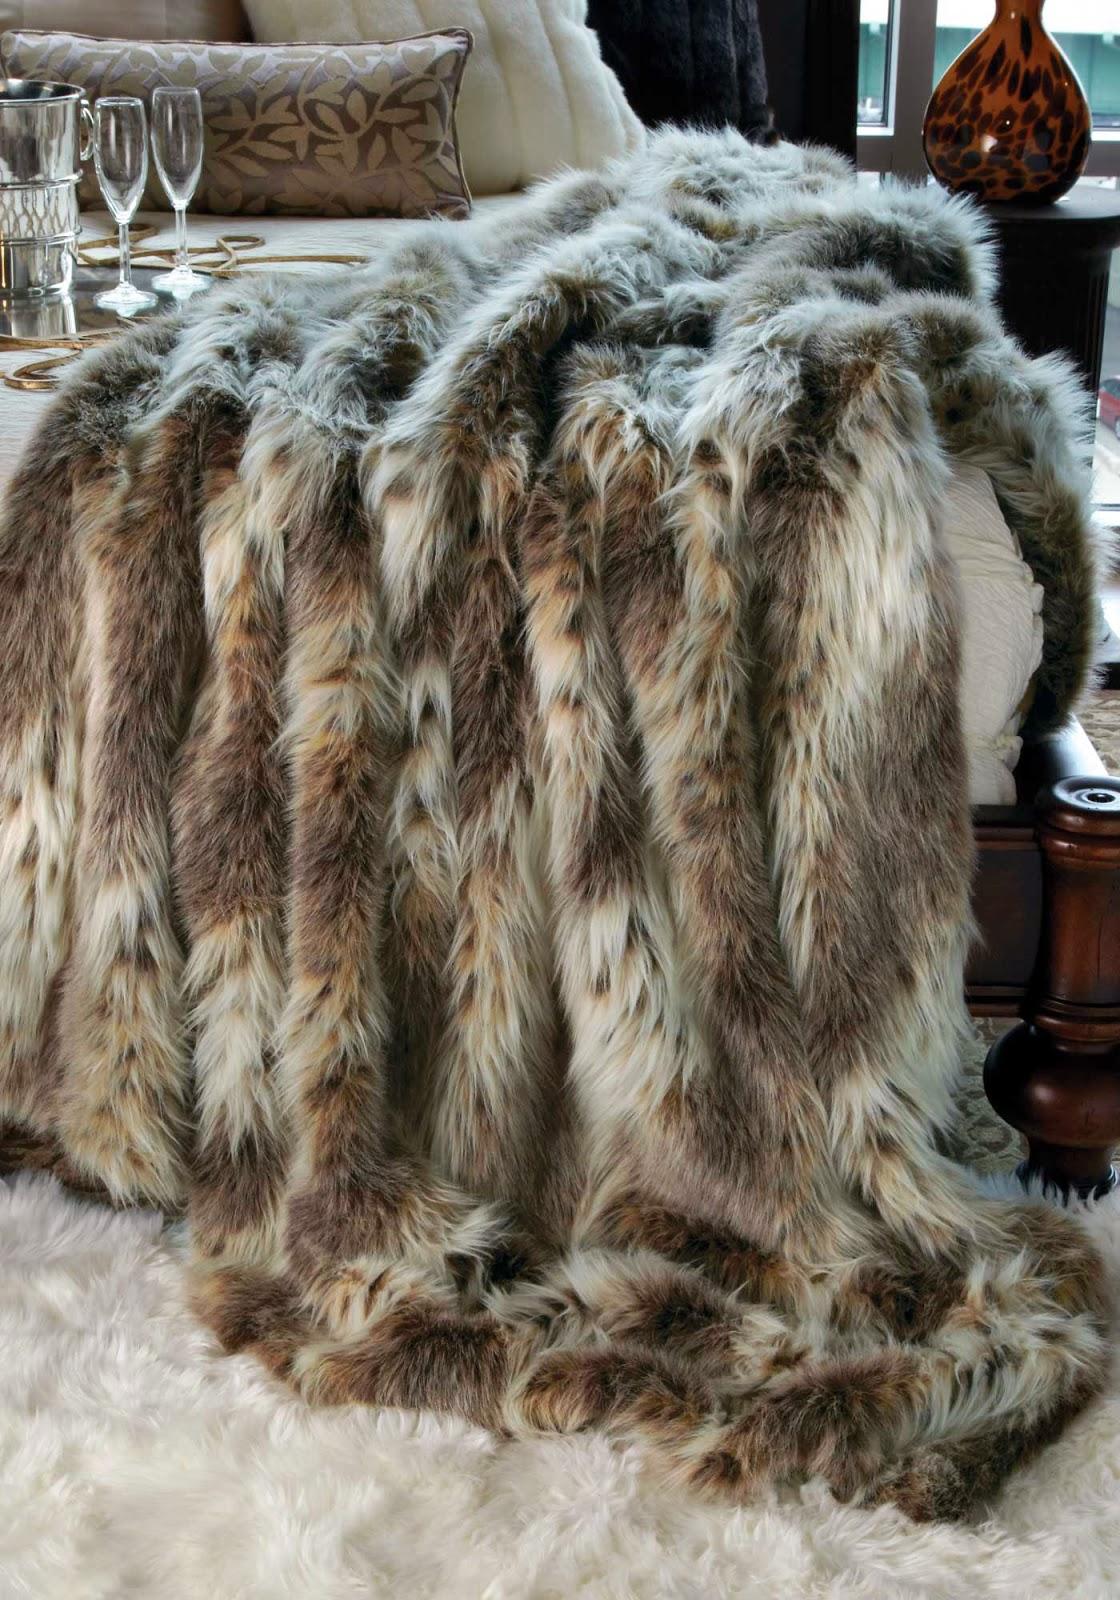 FRESH  TWIST  Decorating with Sheepskin  Faux Fur